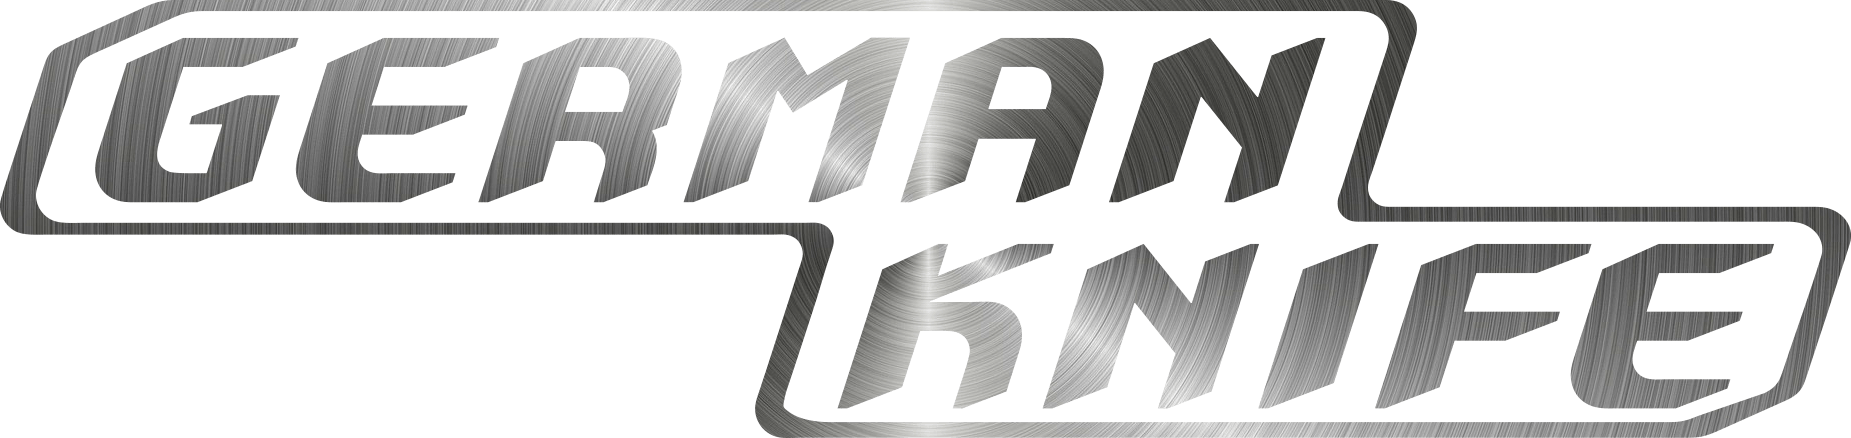 logos_footer3